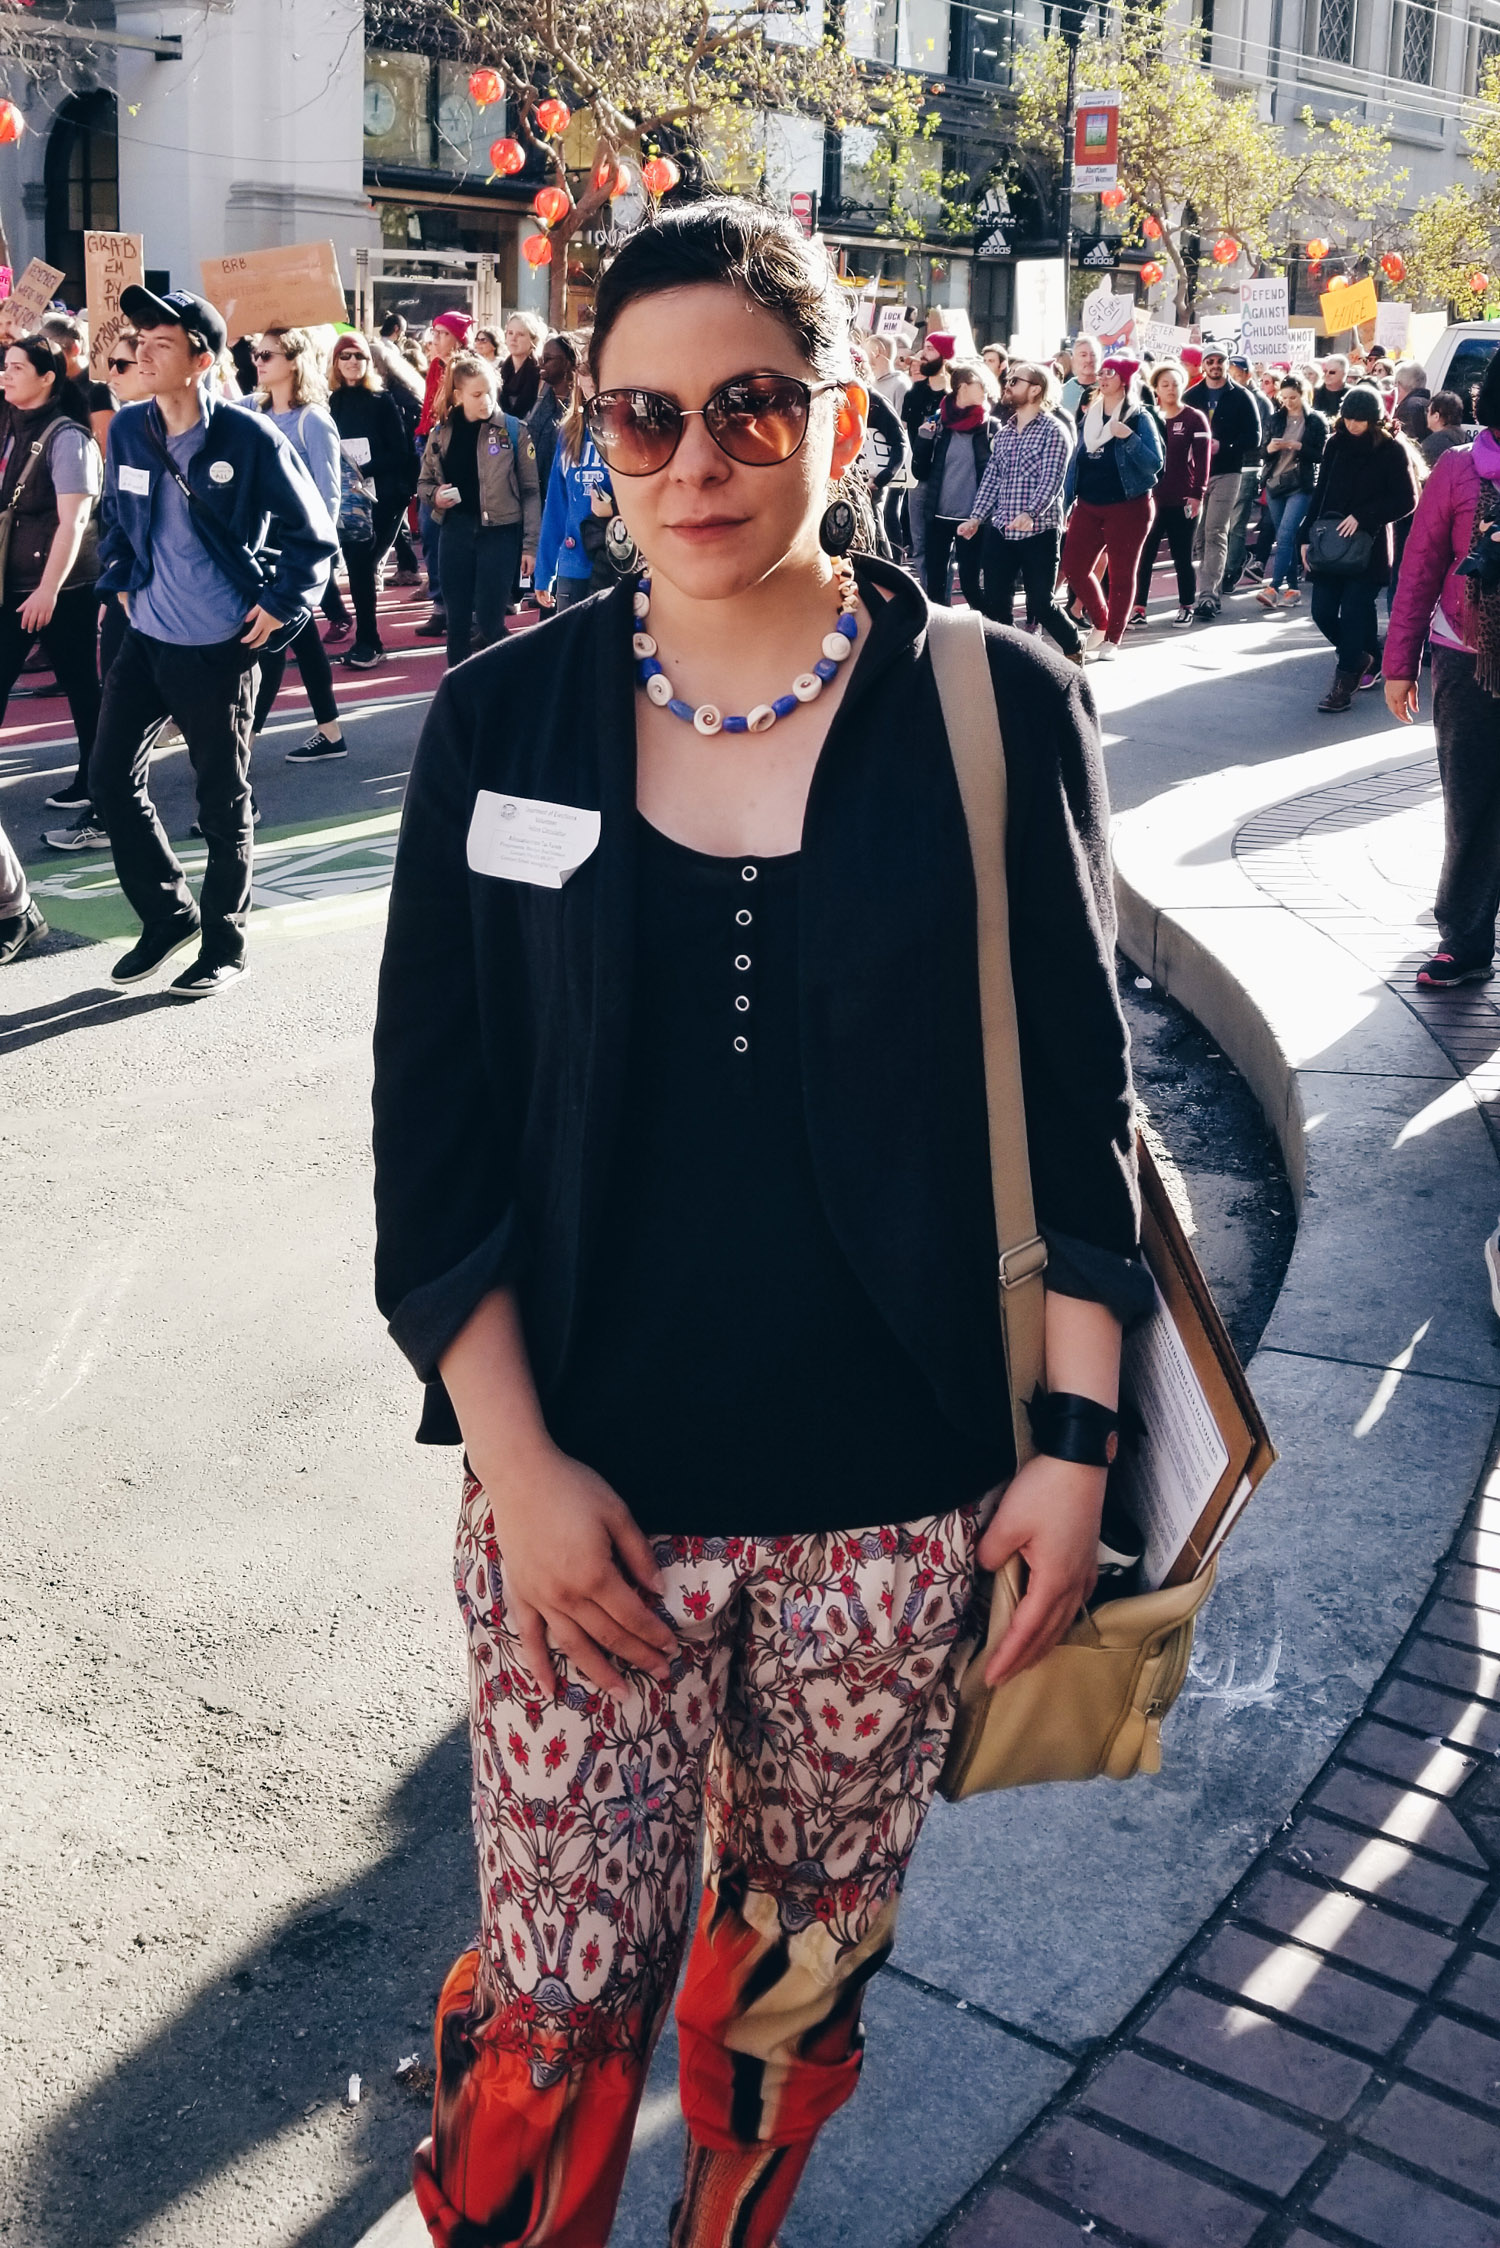 Women's March + signature gathering